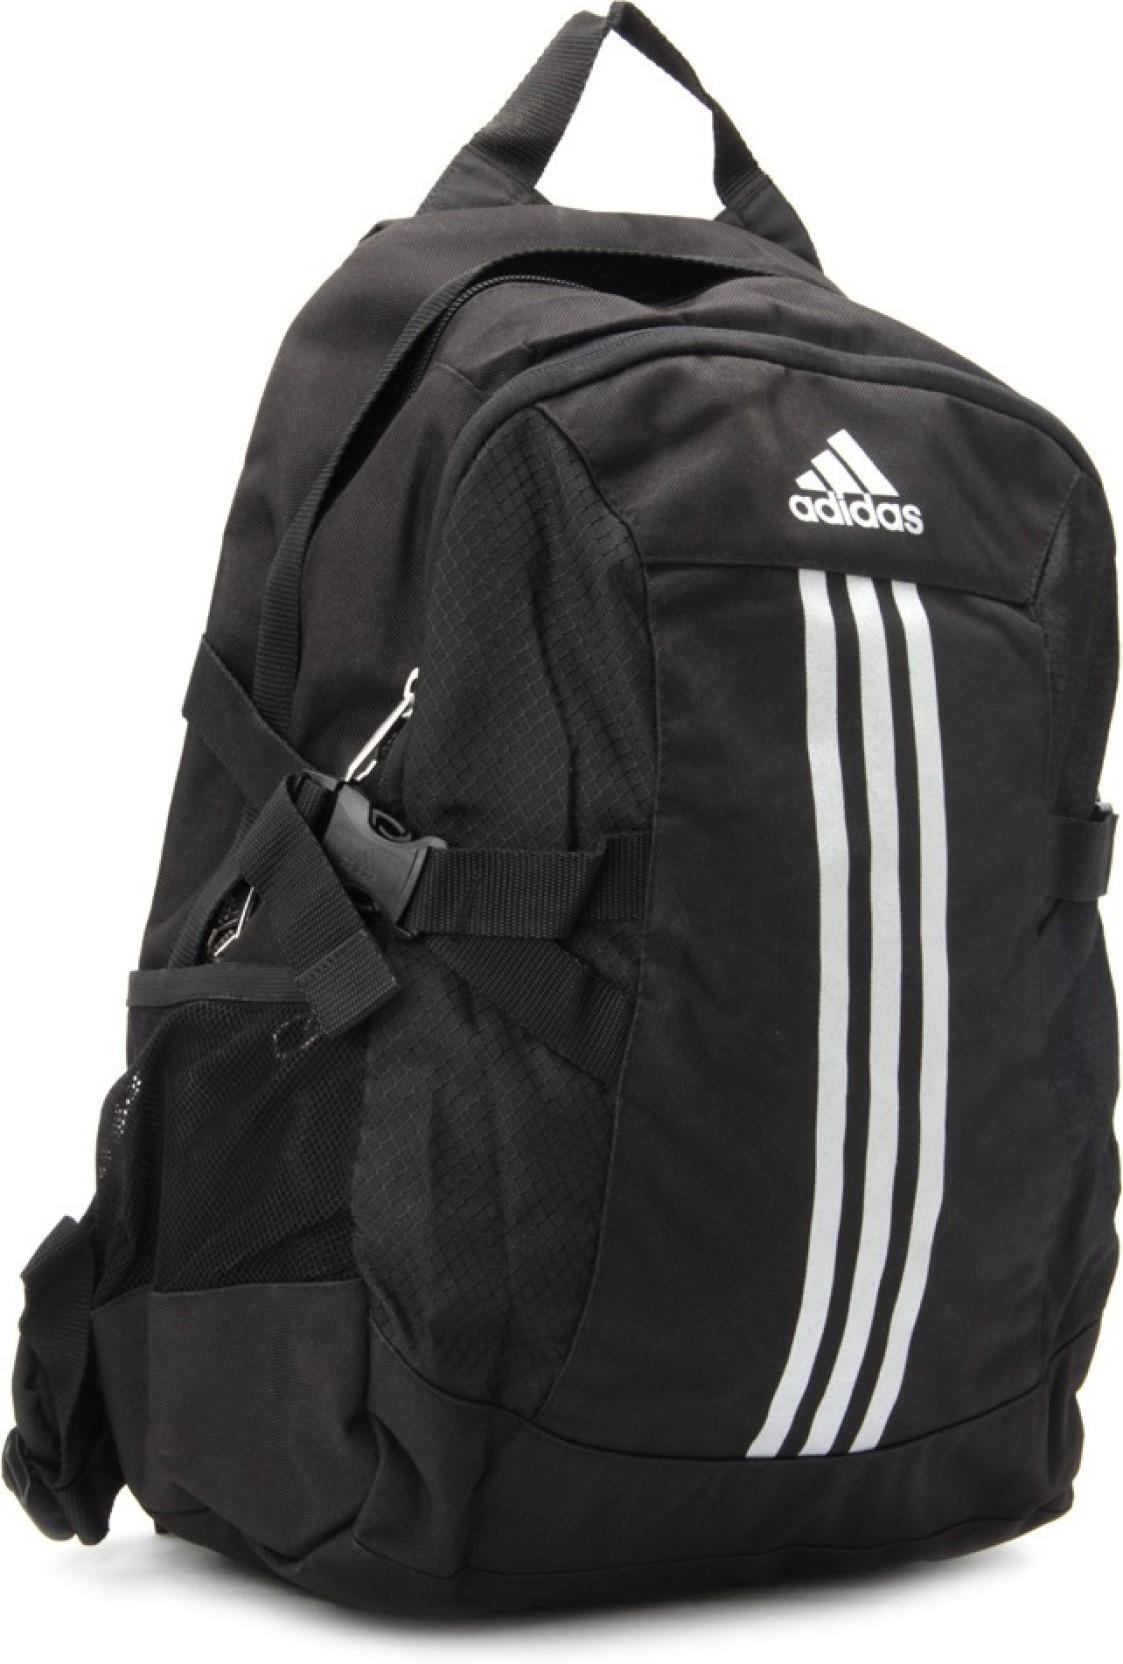 Adidas Energy Running Backpack   ReGreen Springfield f12245906f